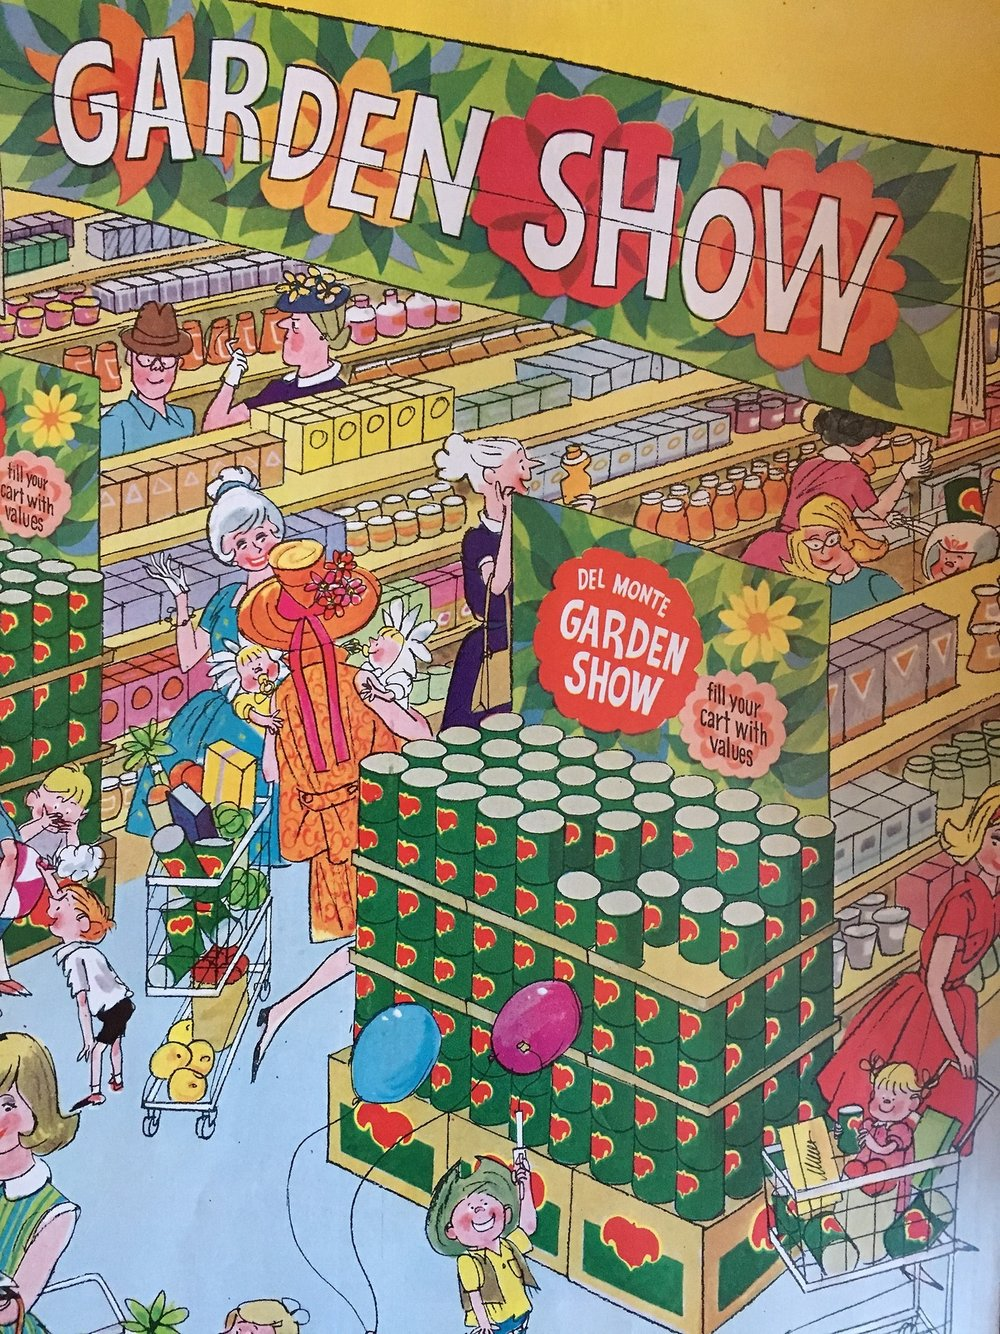 Del Monte Garden Show. Ladies' Home Journal. May 1963